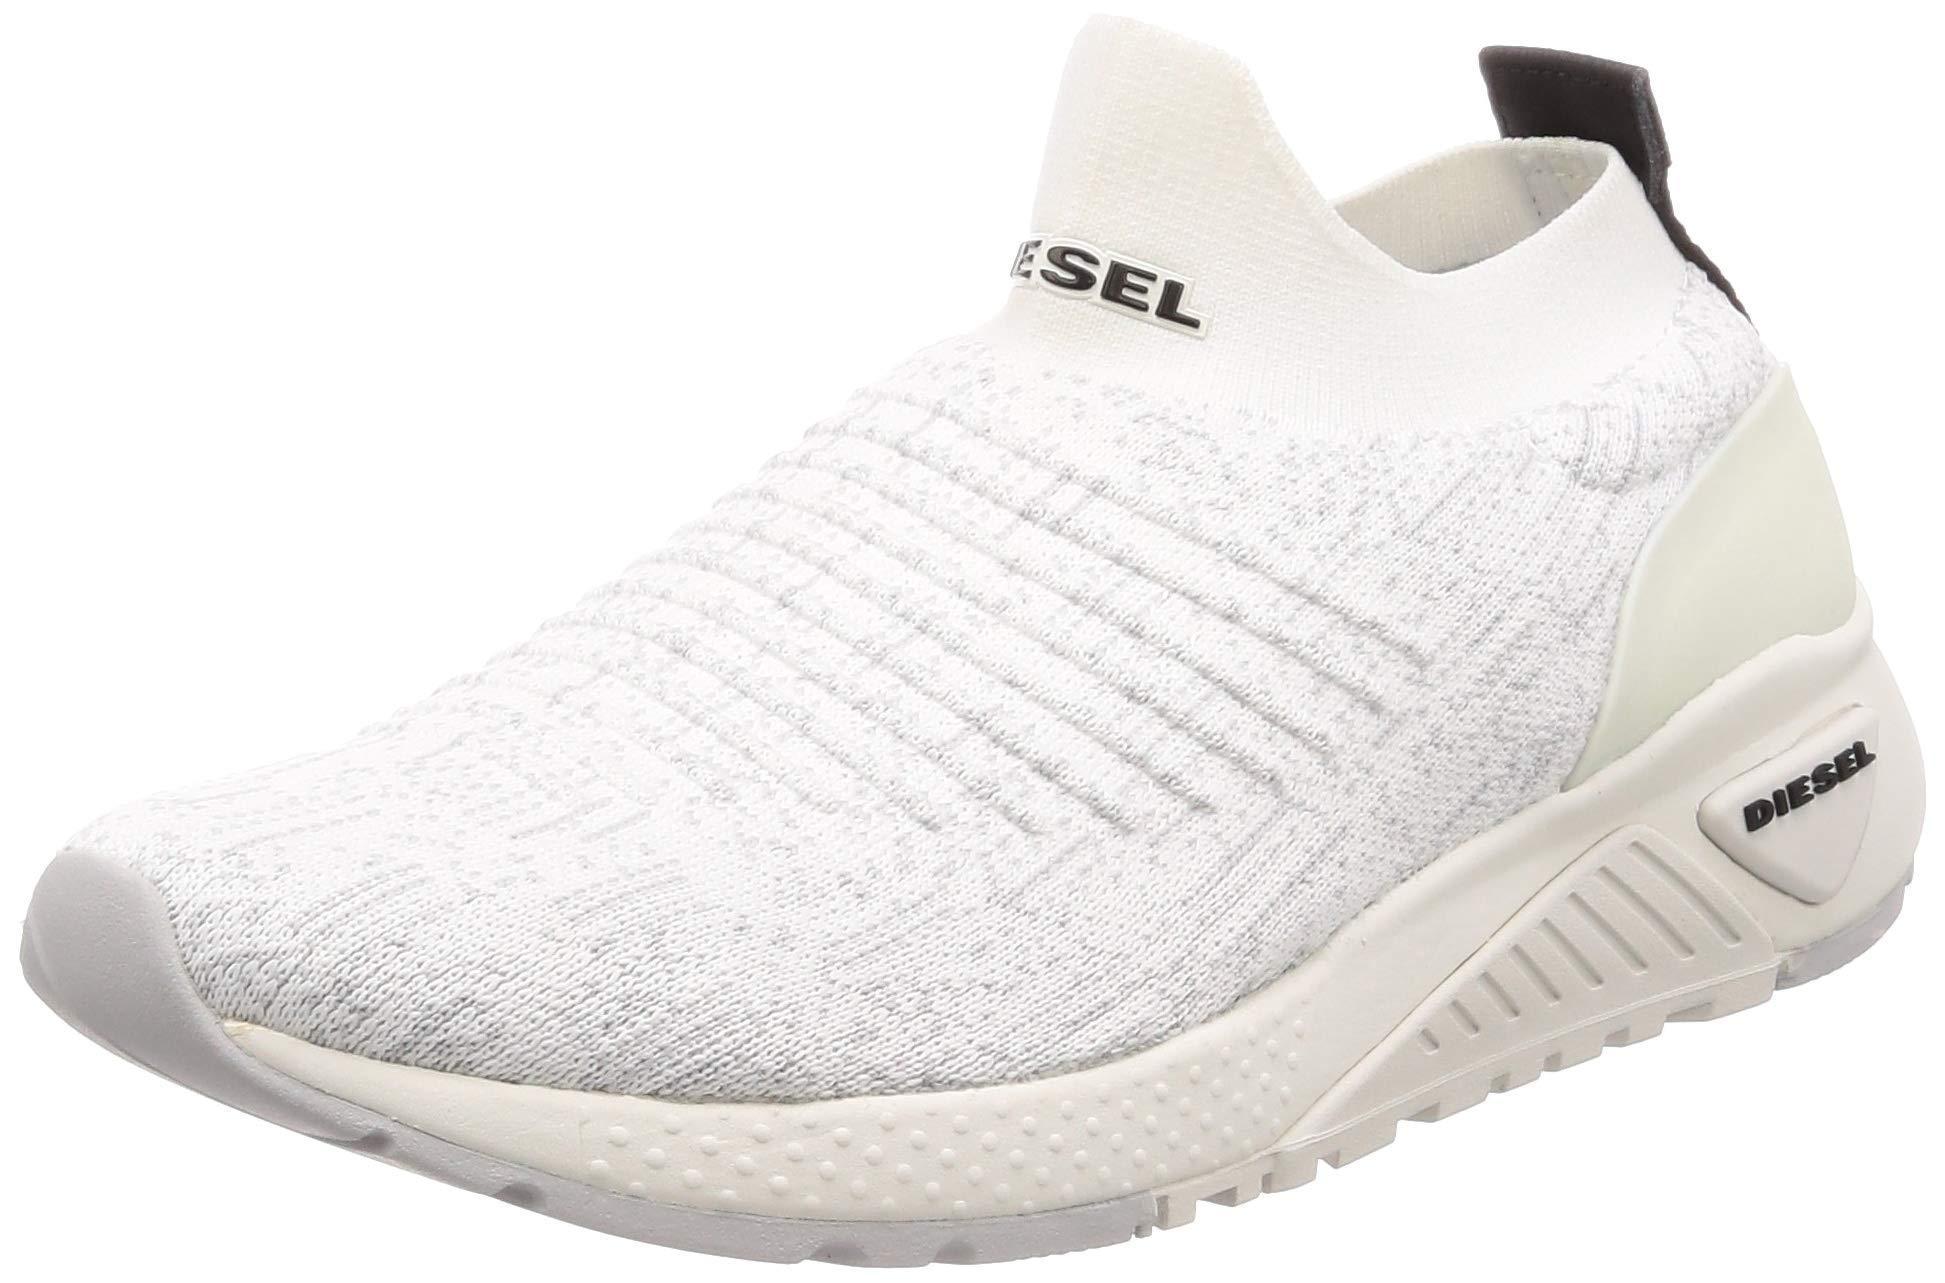 DIESEL Skb S-kb Athl Sock Sneaker in